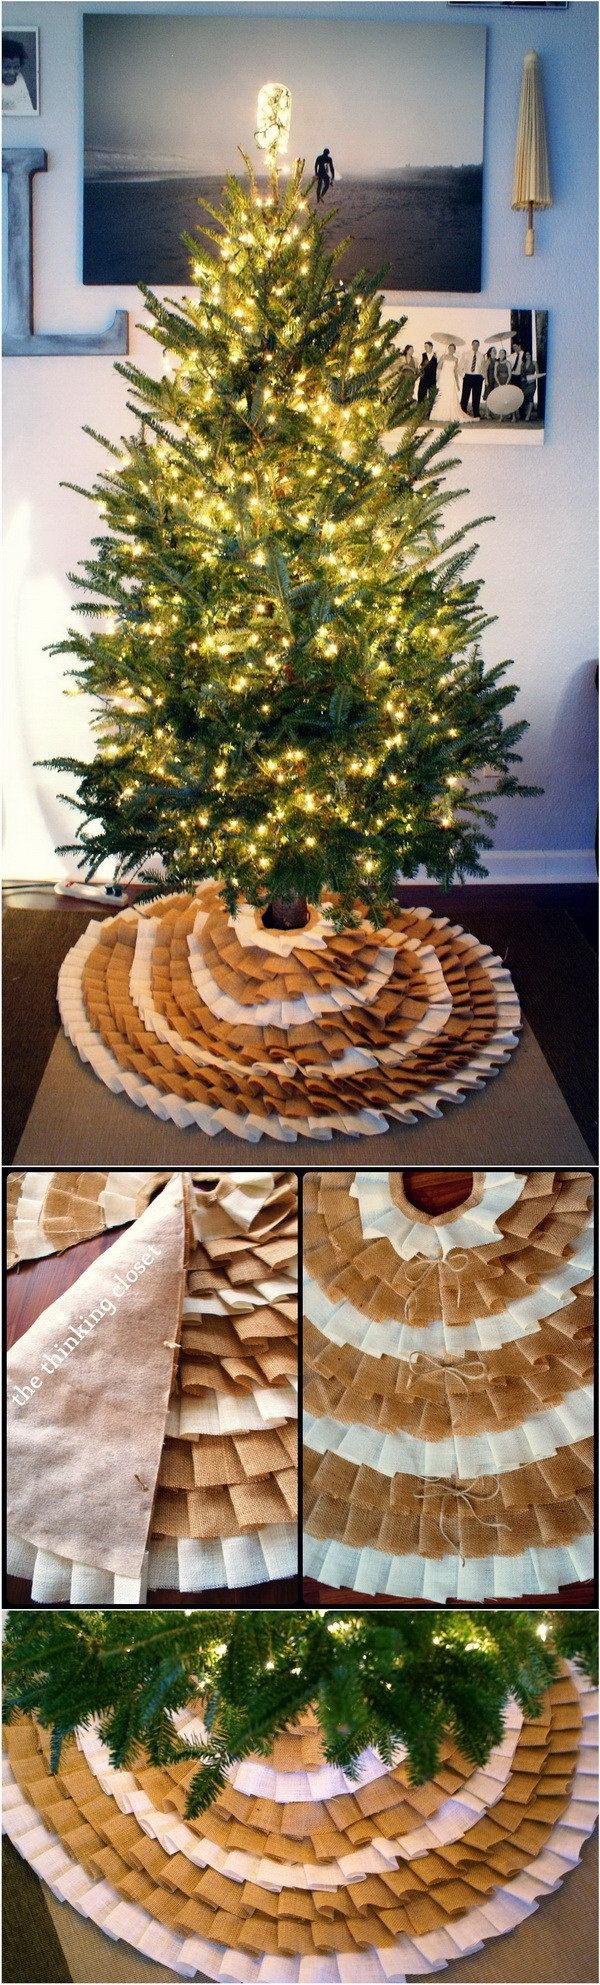 DIY No-Sew Ruffle Christmas Tree Skirt.